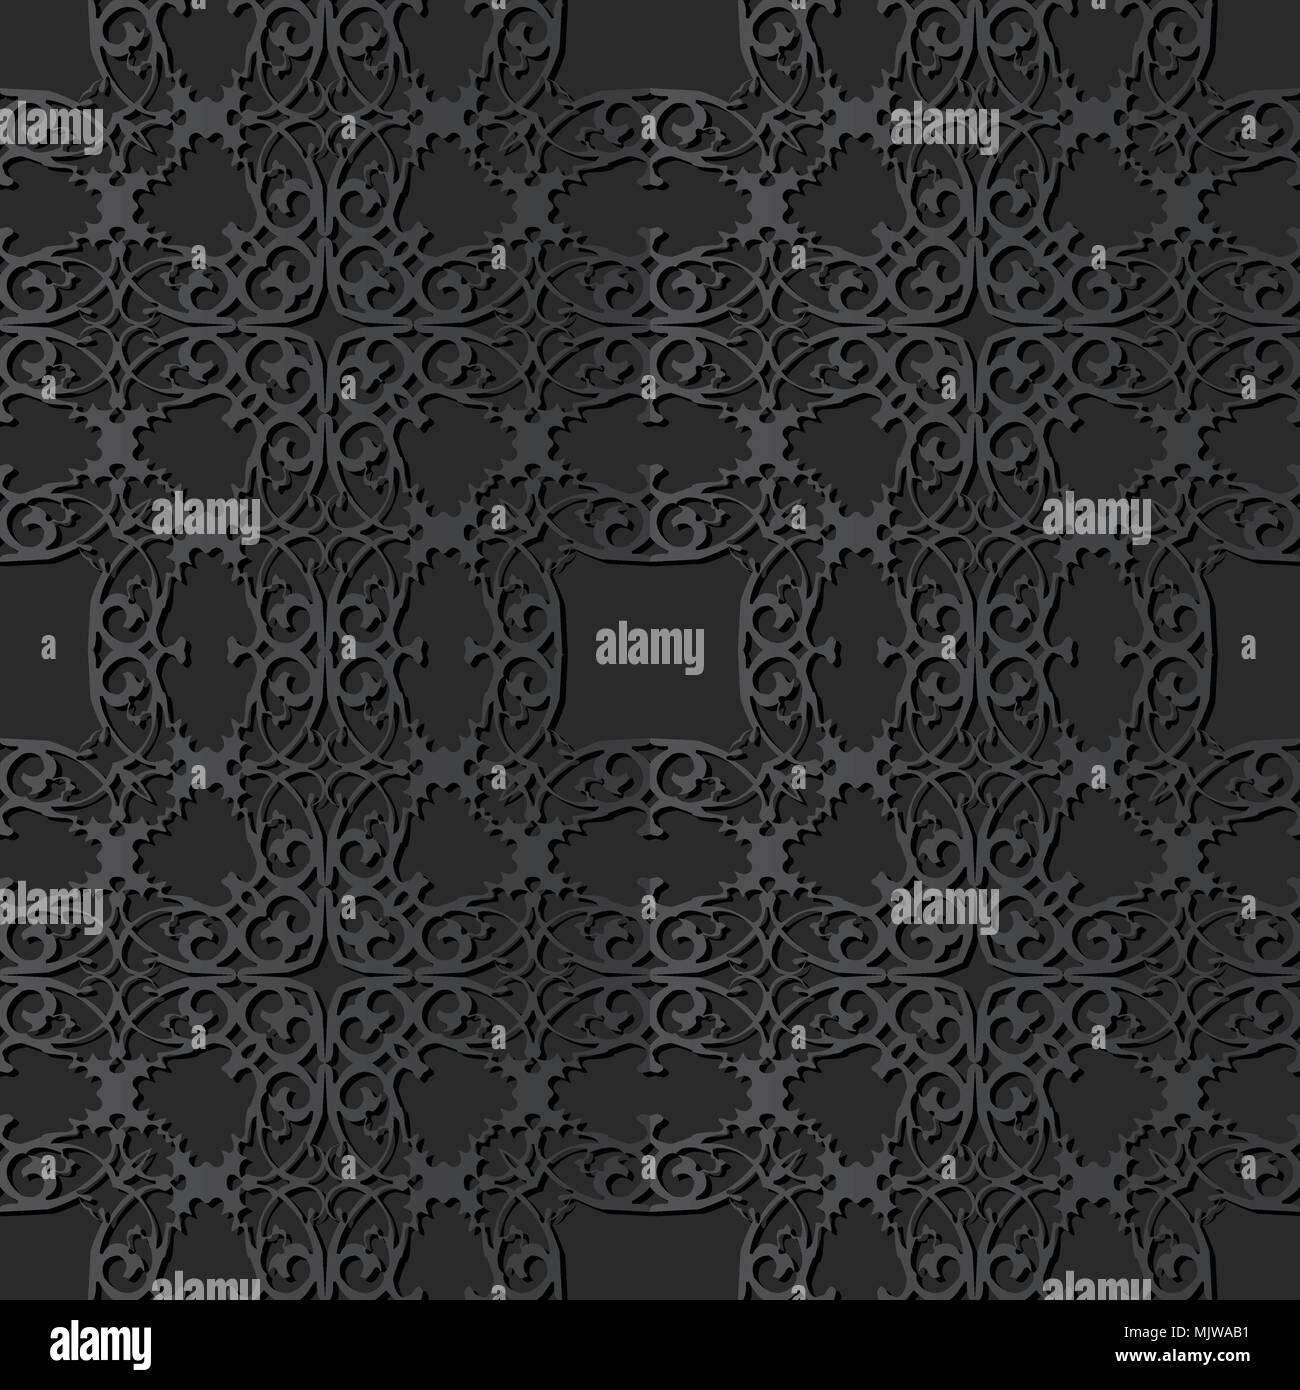 3D dark paper art Spiral Curve Cross Royal Frame Crest, Vector stylish decoration pattern background for web banner greeting card design - Stock Image